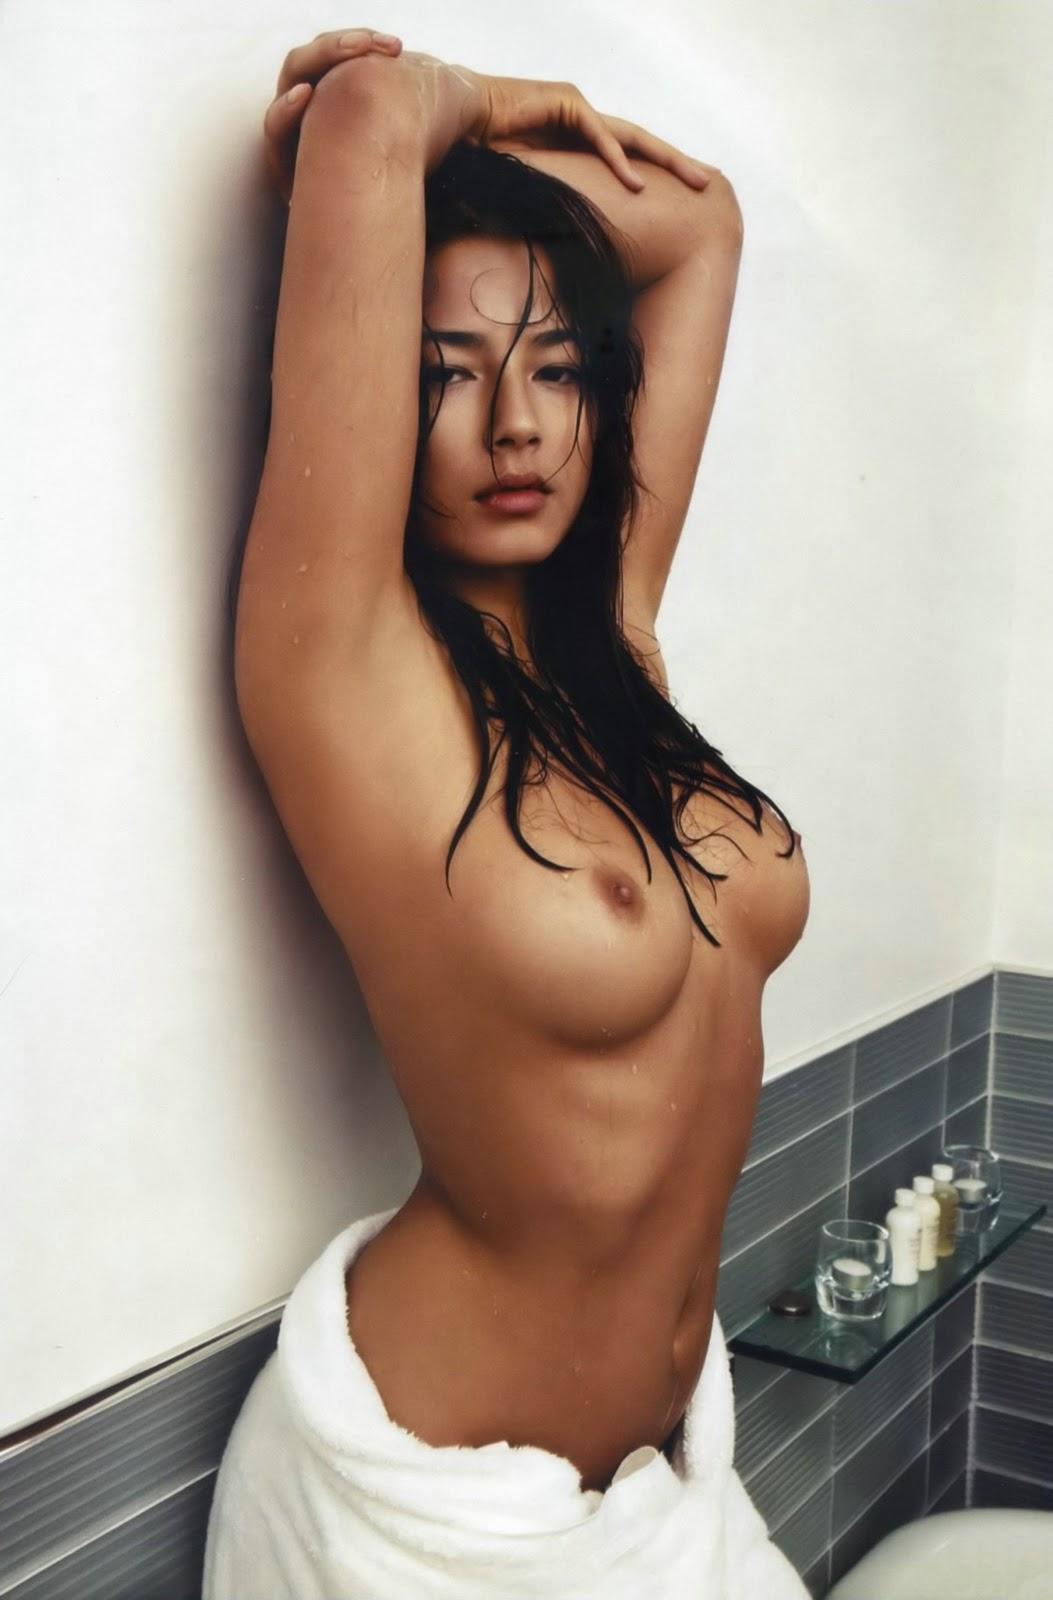 http://4.bp.blogspot.com/_pGTlBw_z2AM/TLA2CsWF5GI/AAAAAAAAAv4/cPLGkFRbwOc/s1600/jessica-gomes-topless-gq-italy-06.jpg